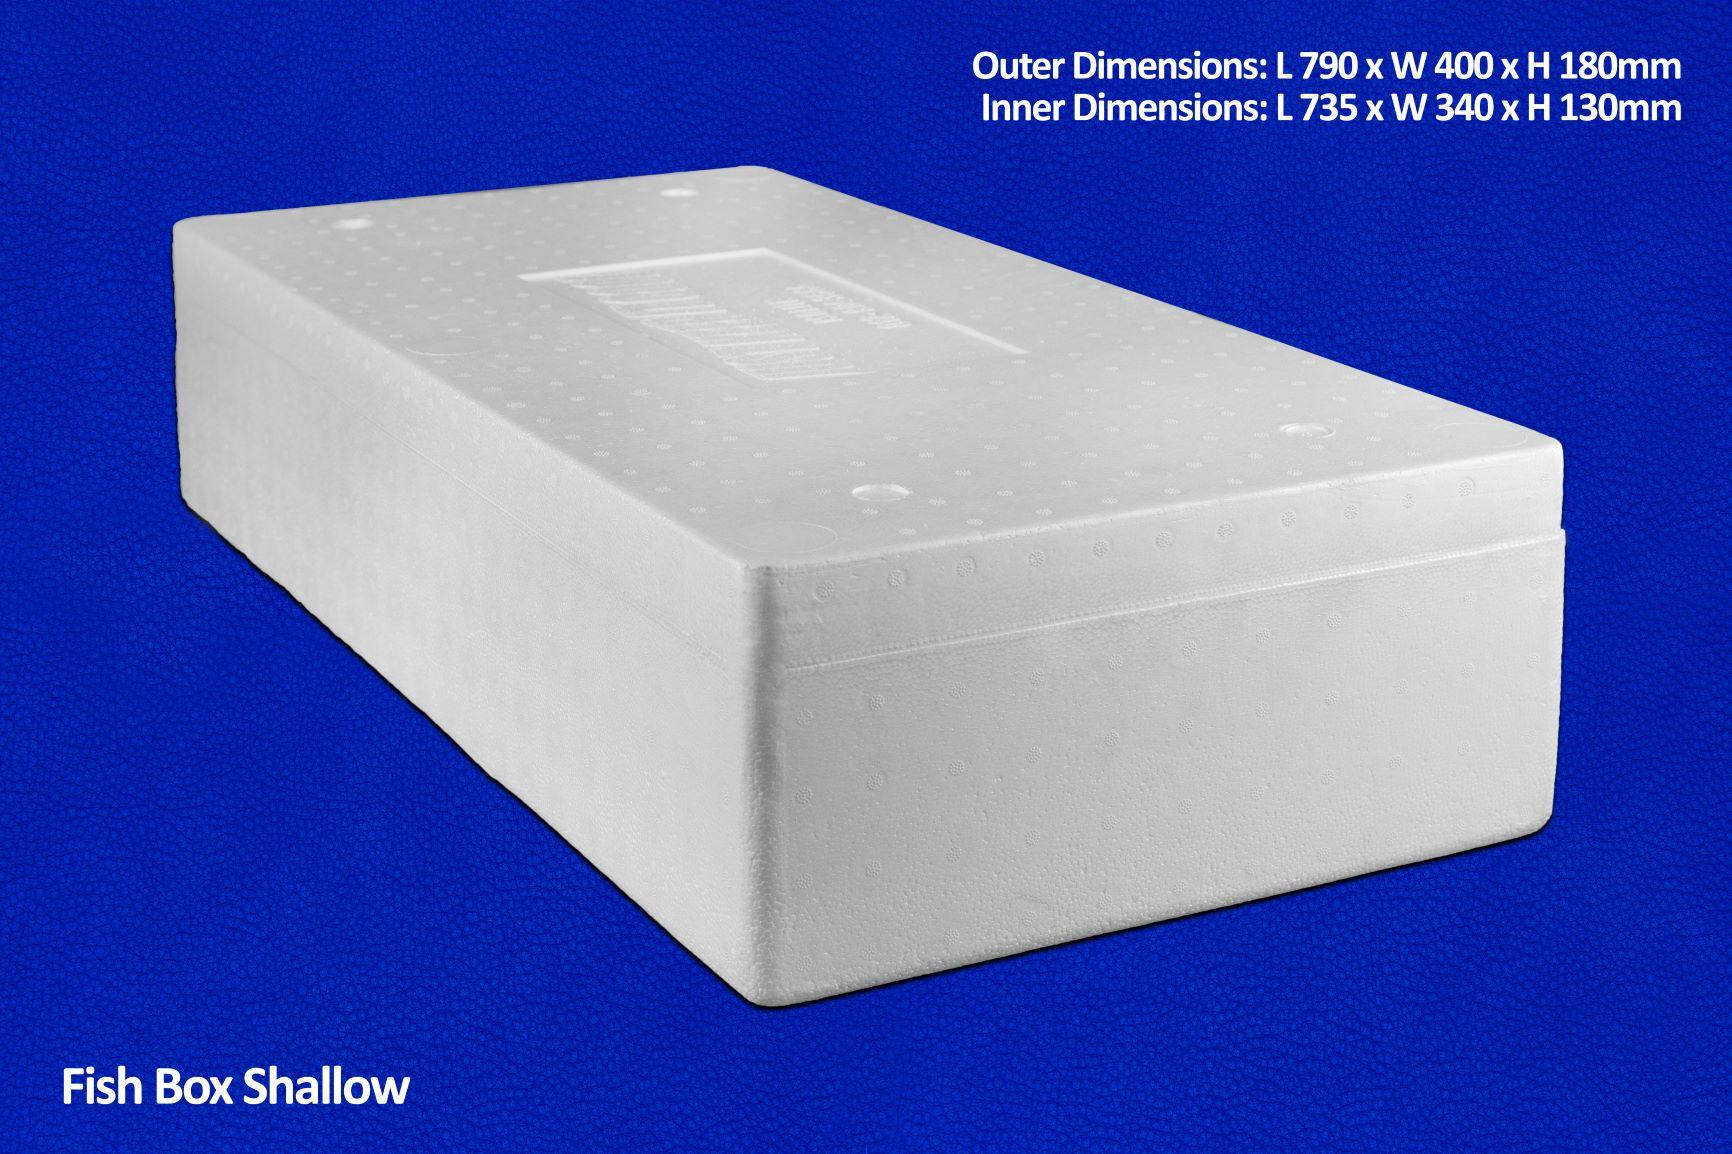 Fish Box Shallow